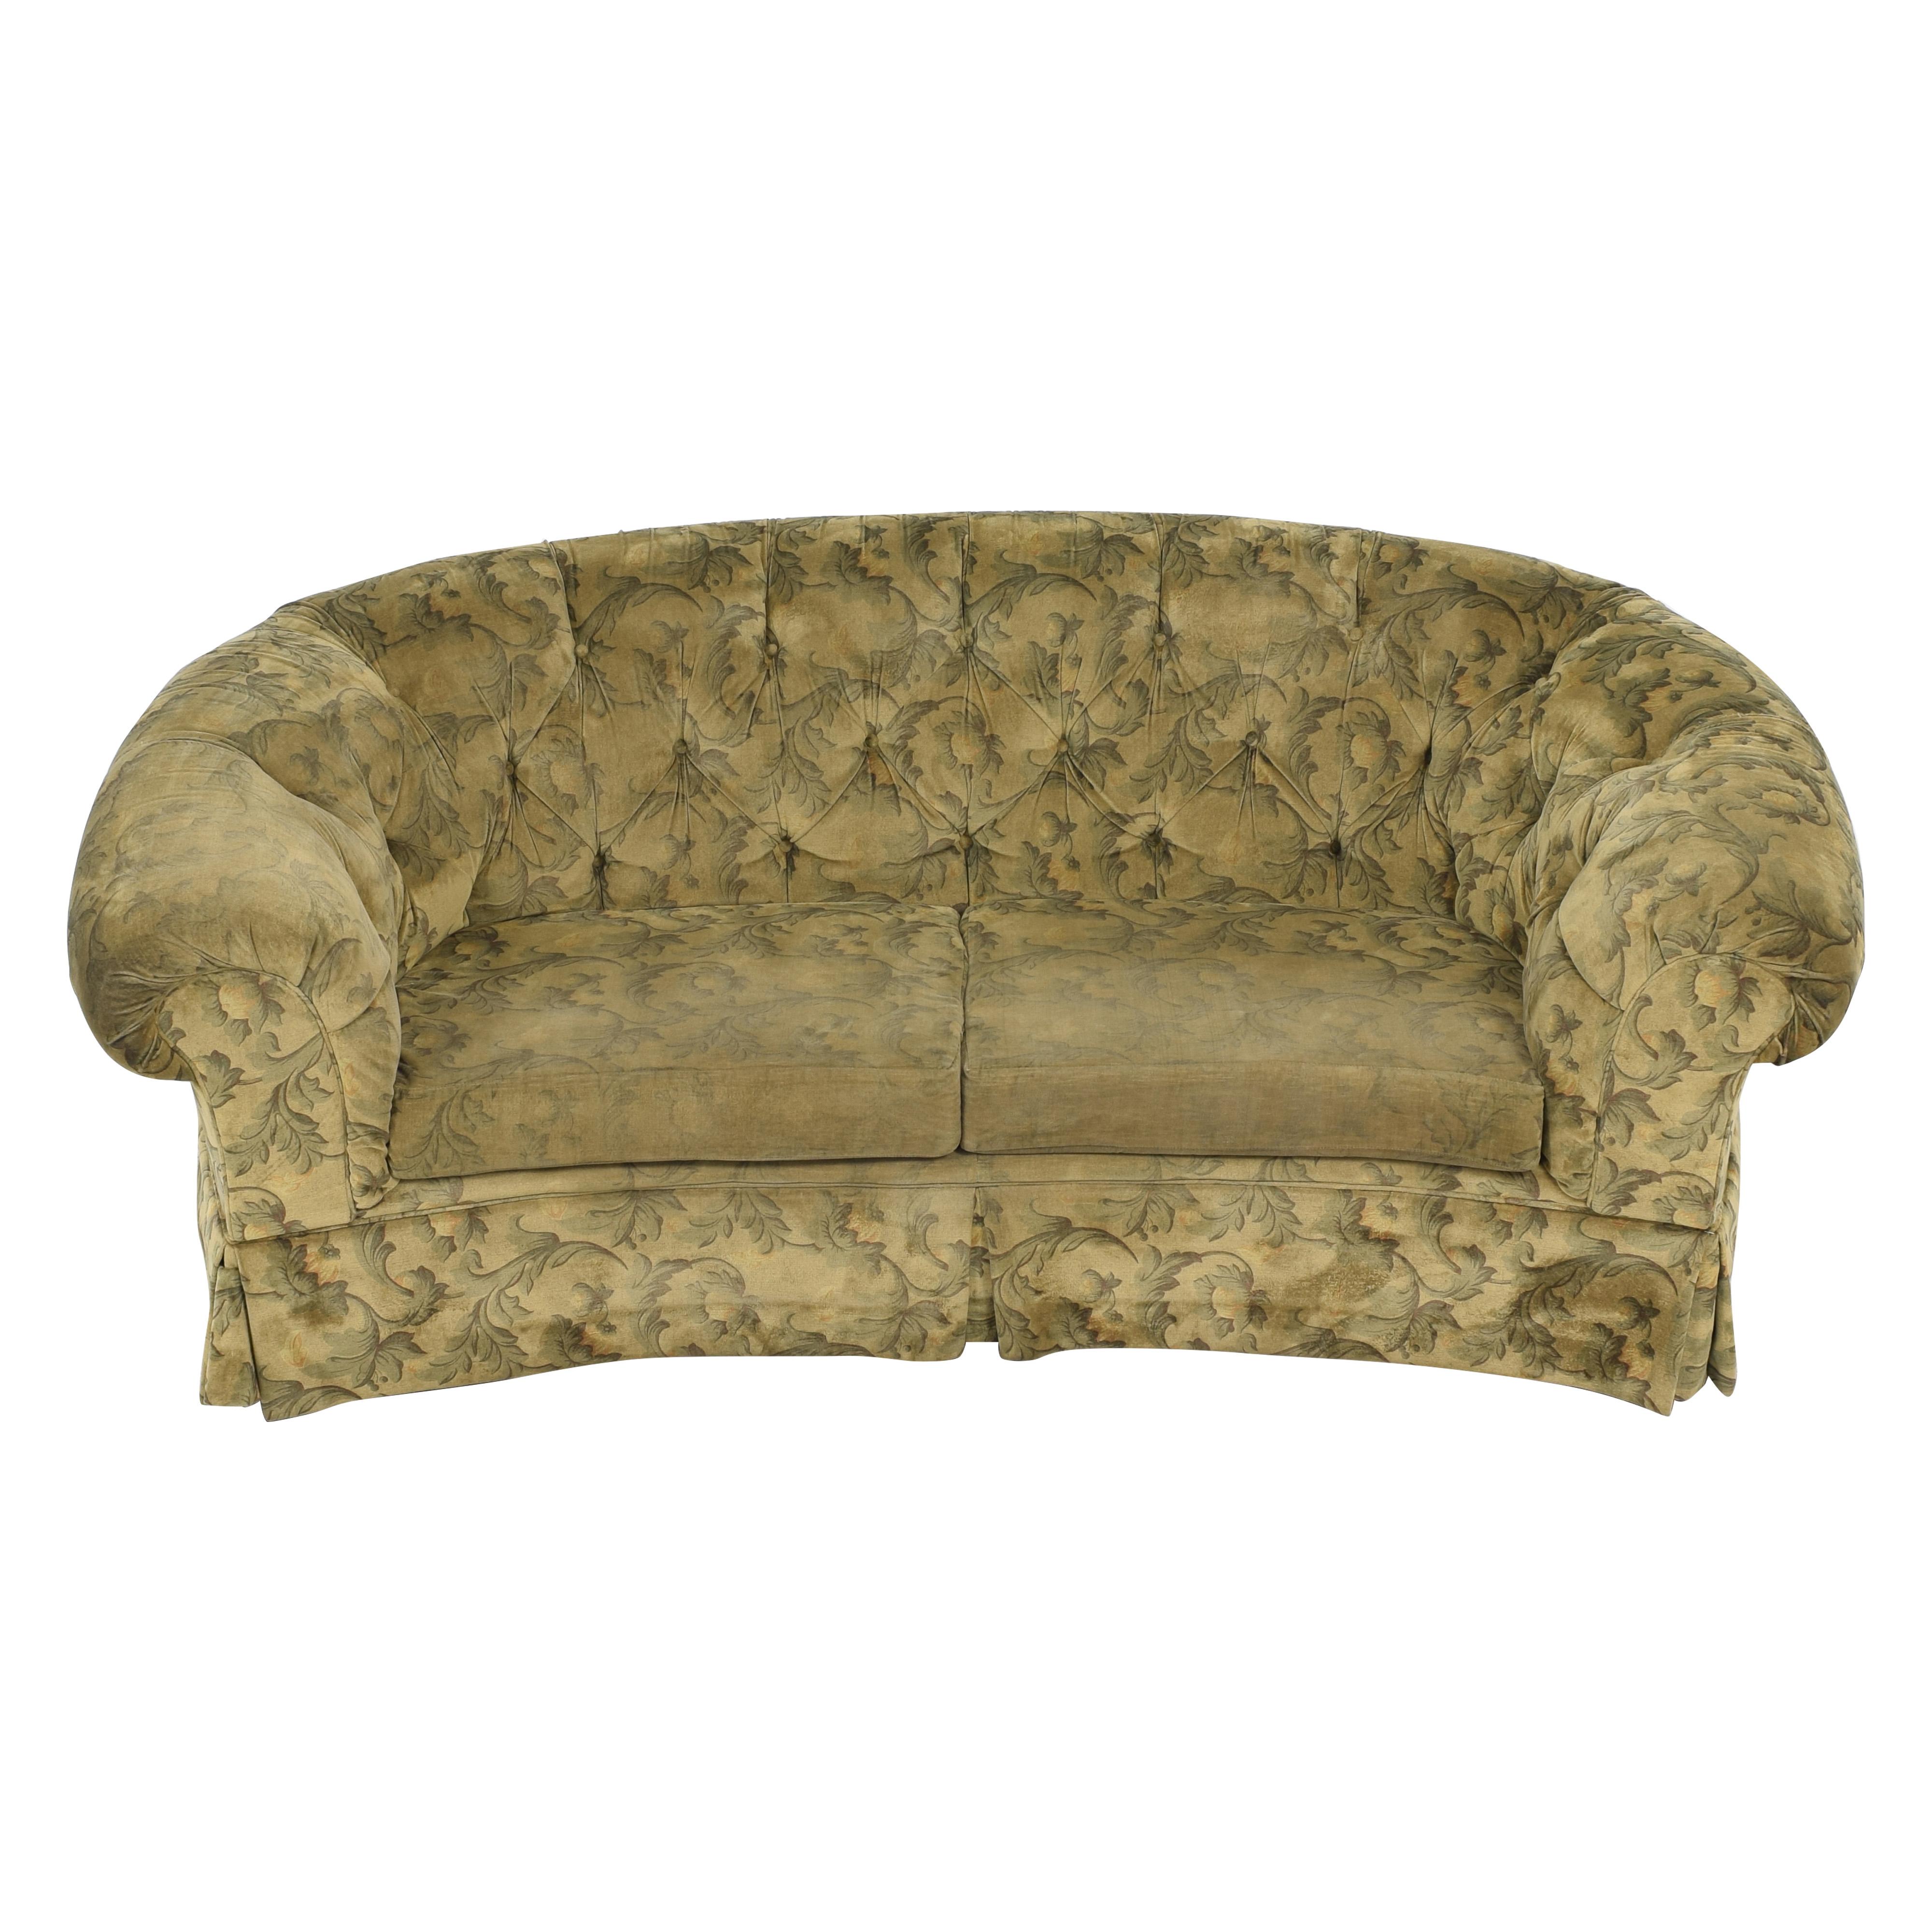 City Furniture Chesterfield Sofa / Sofas